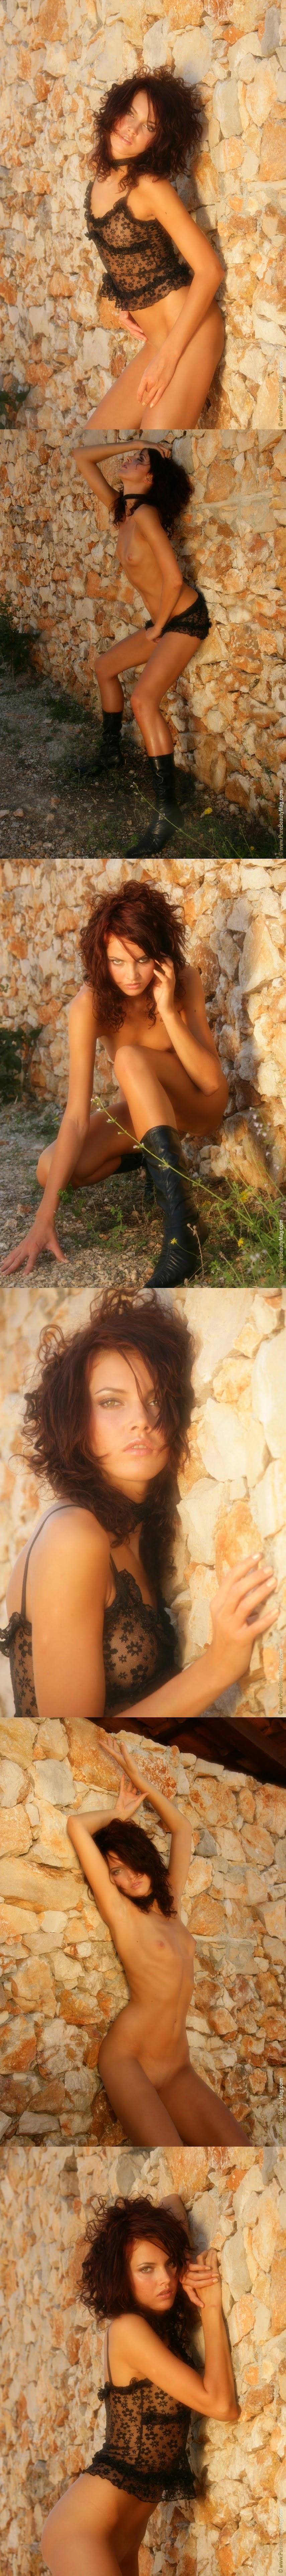 PureBeautyMag PBM  - 2005-10-28 -  s137649 - Jitka Branich - Sexy Vixen - 3600px PBM__-_2005-10-28_-__s137649_-_Jitka_Branich_-_Sexy_Vixen_-_3600px.zip-jk-